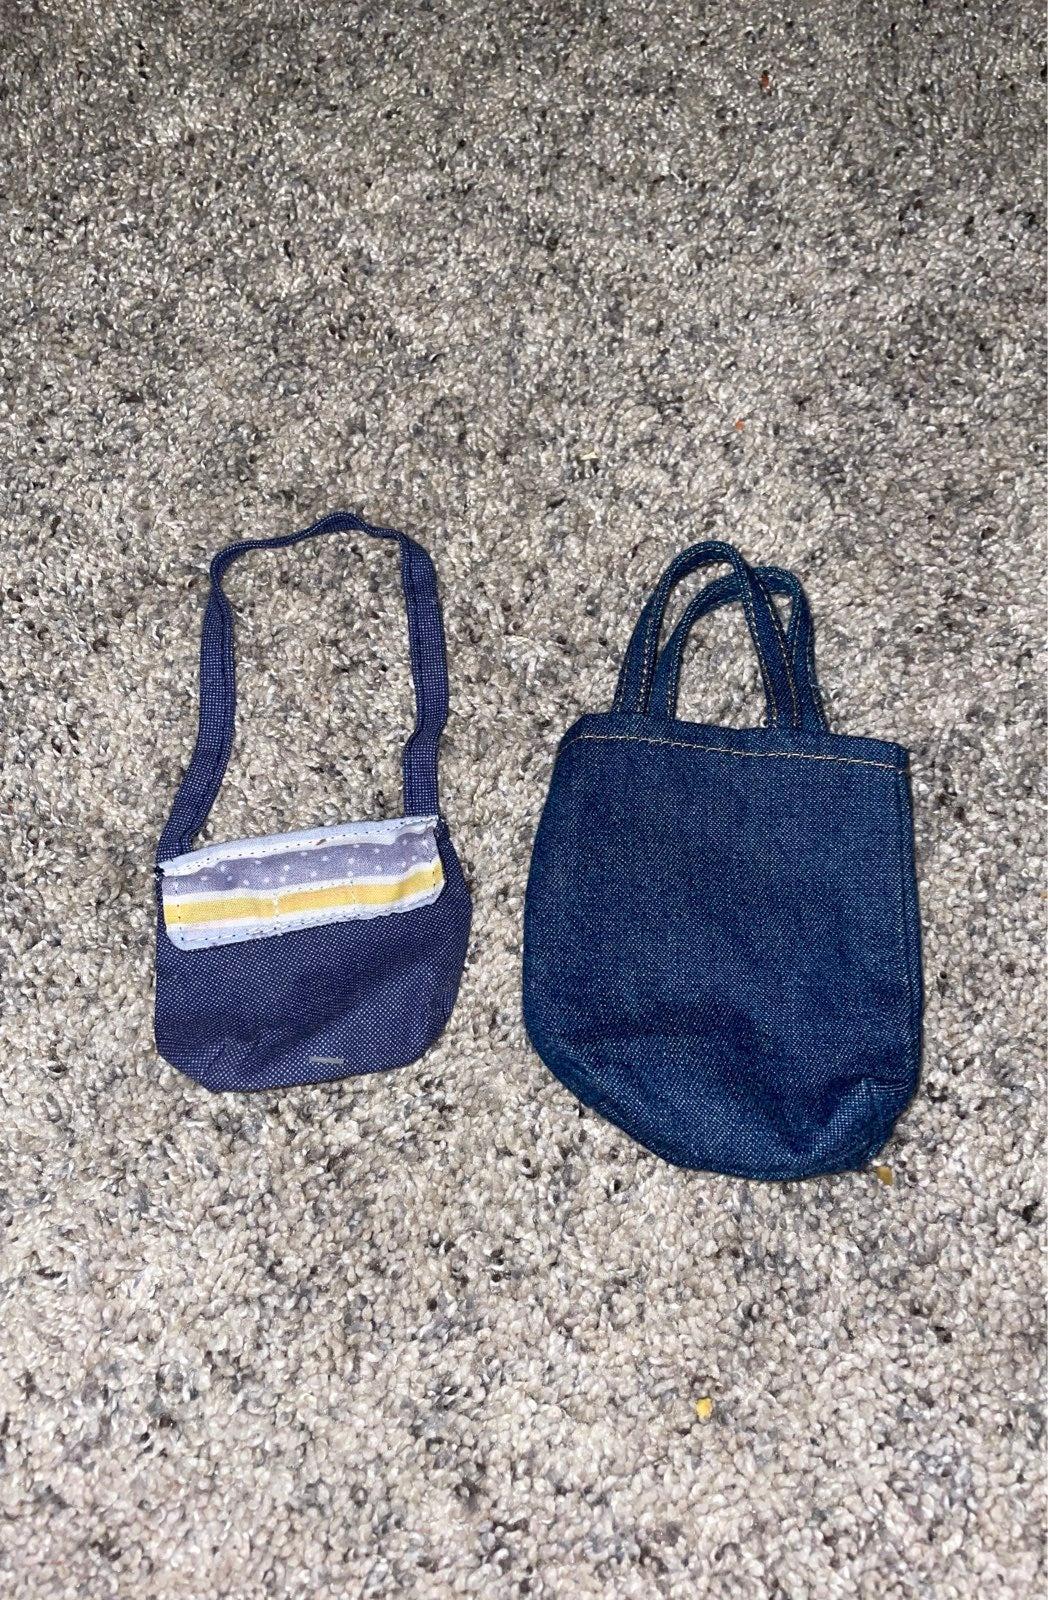 2 American girl doll purses